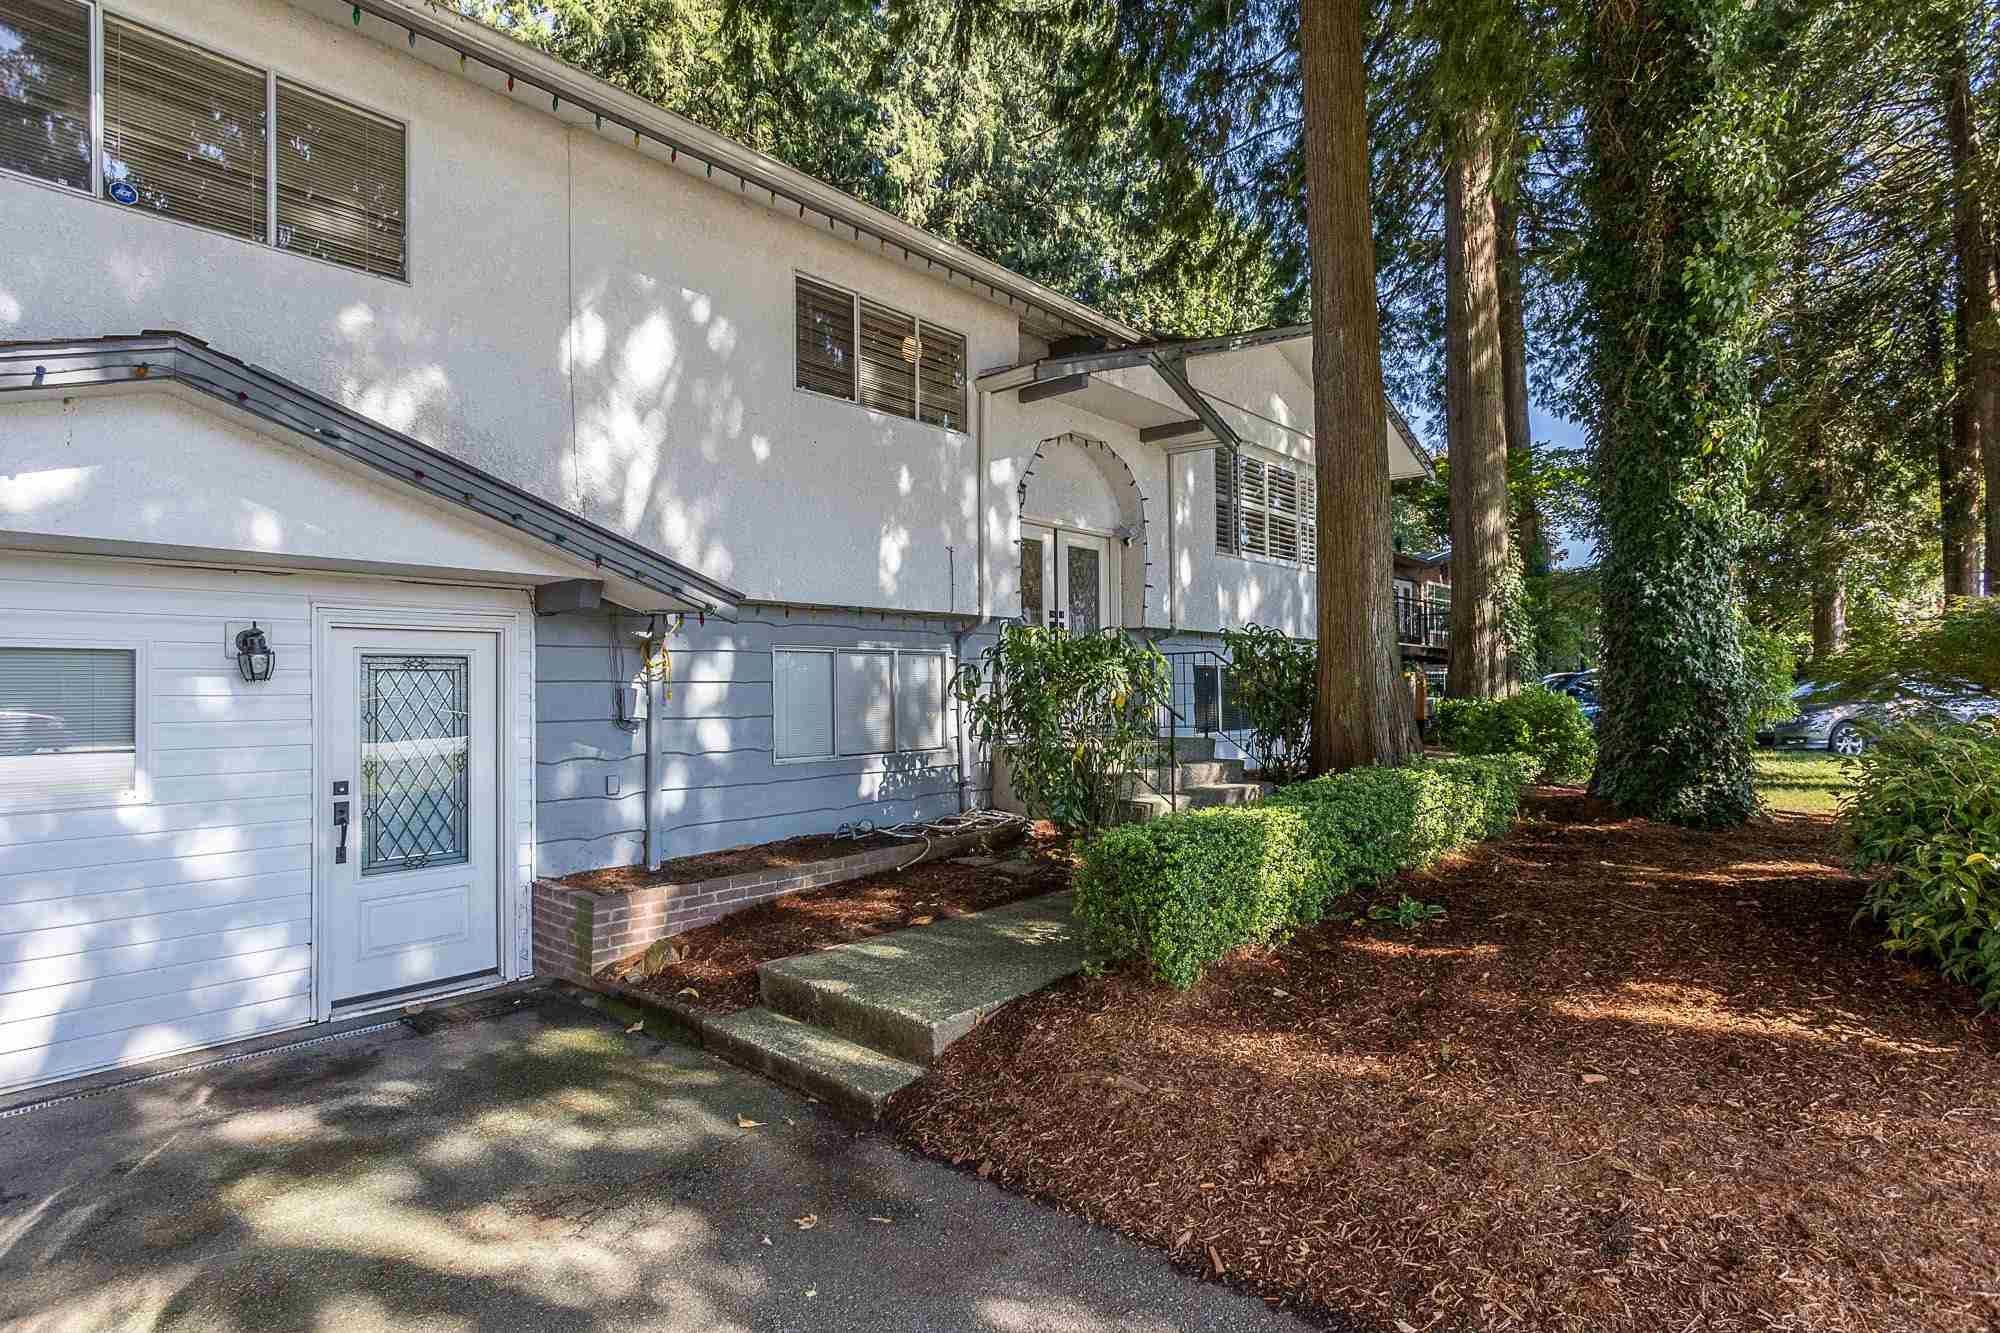 Main Photo: 11670 BONSON Road in Pitt Meadows: South Meadows House for sale : MLS®# R2594010